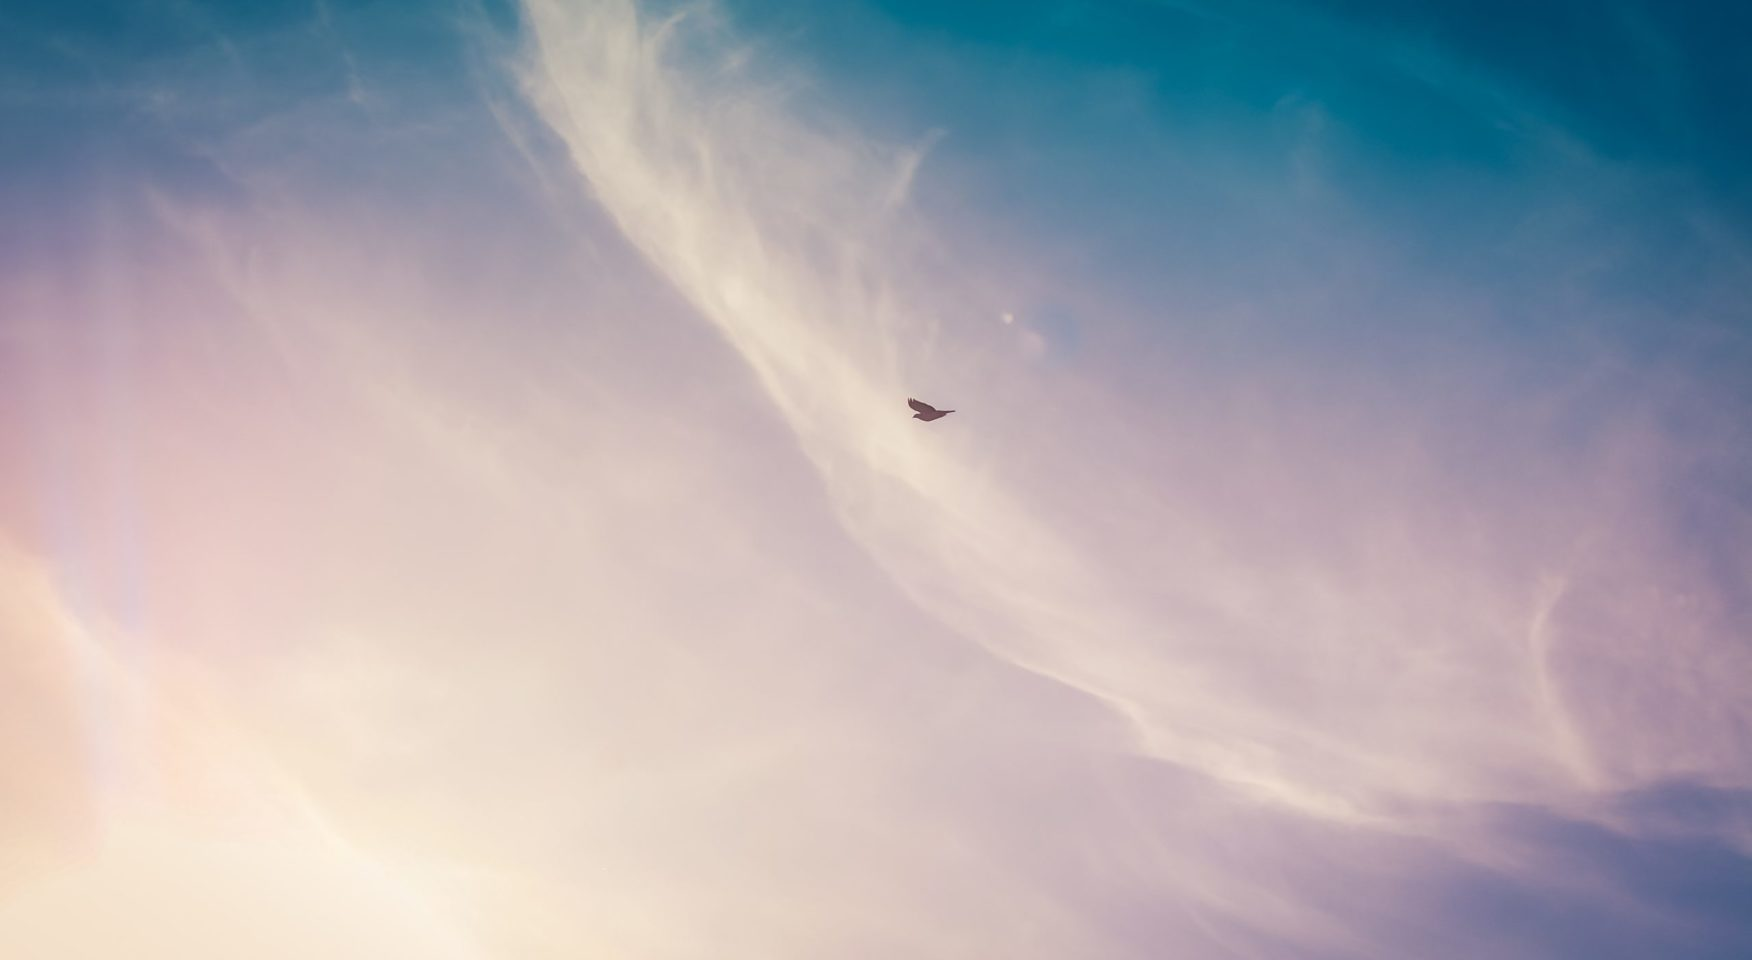 Single bird flying across a wispy sky